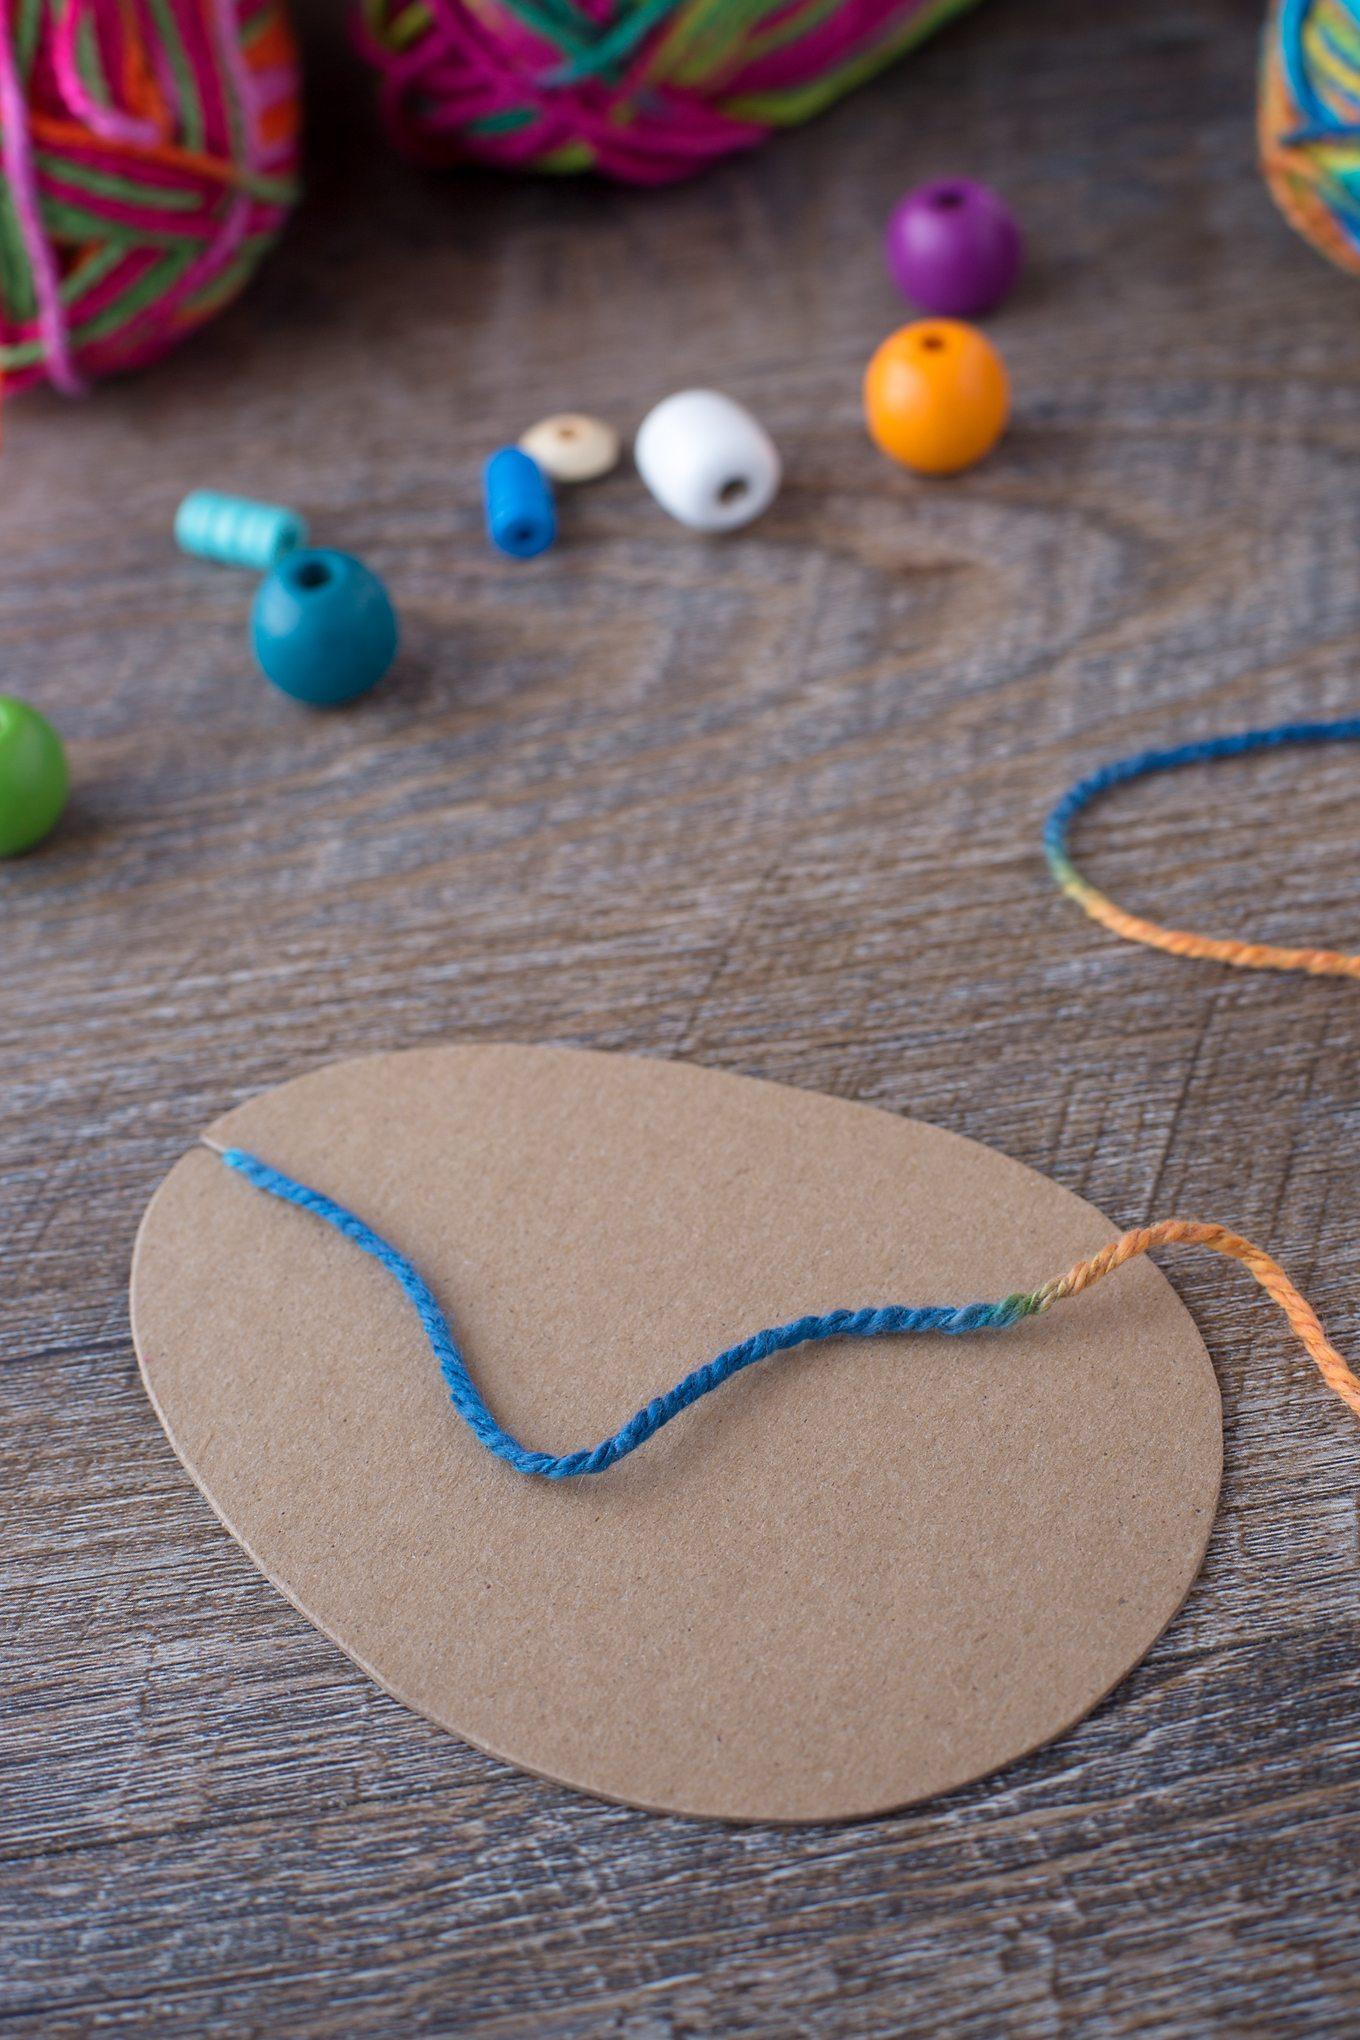 Blue Yarn on Cardboard Easter Egg